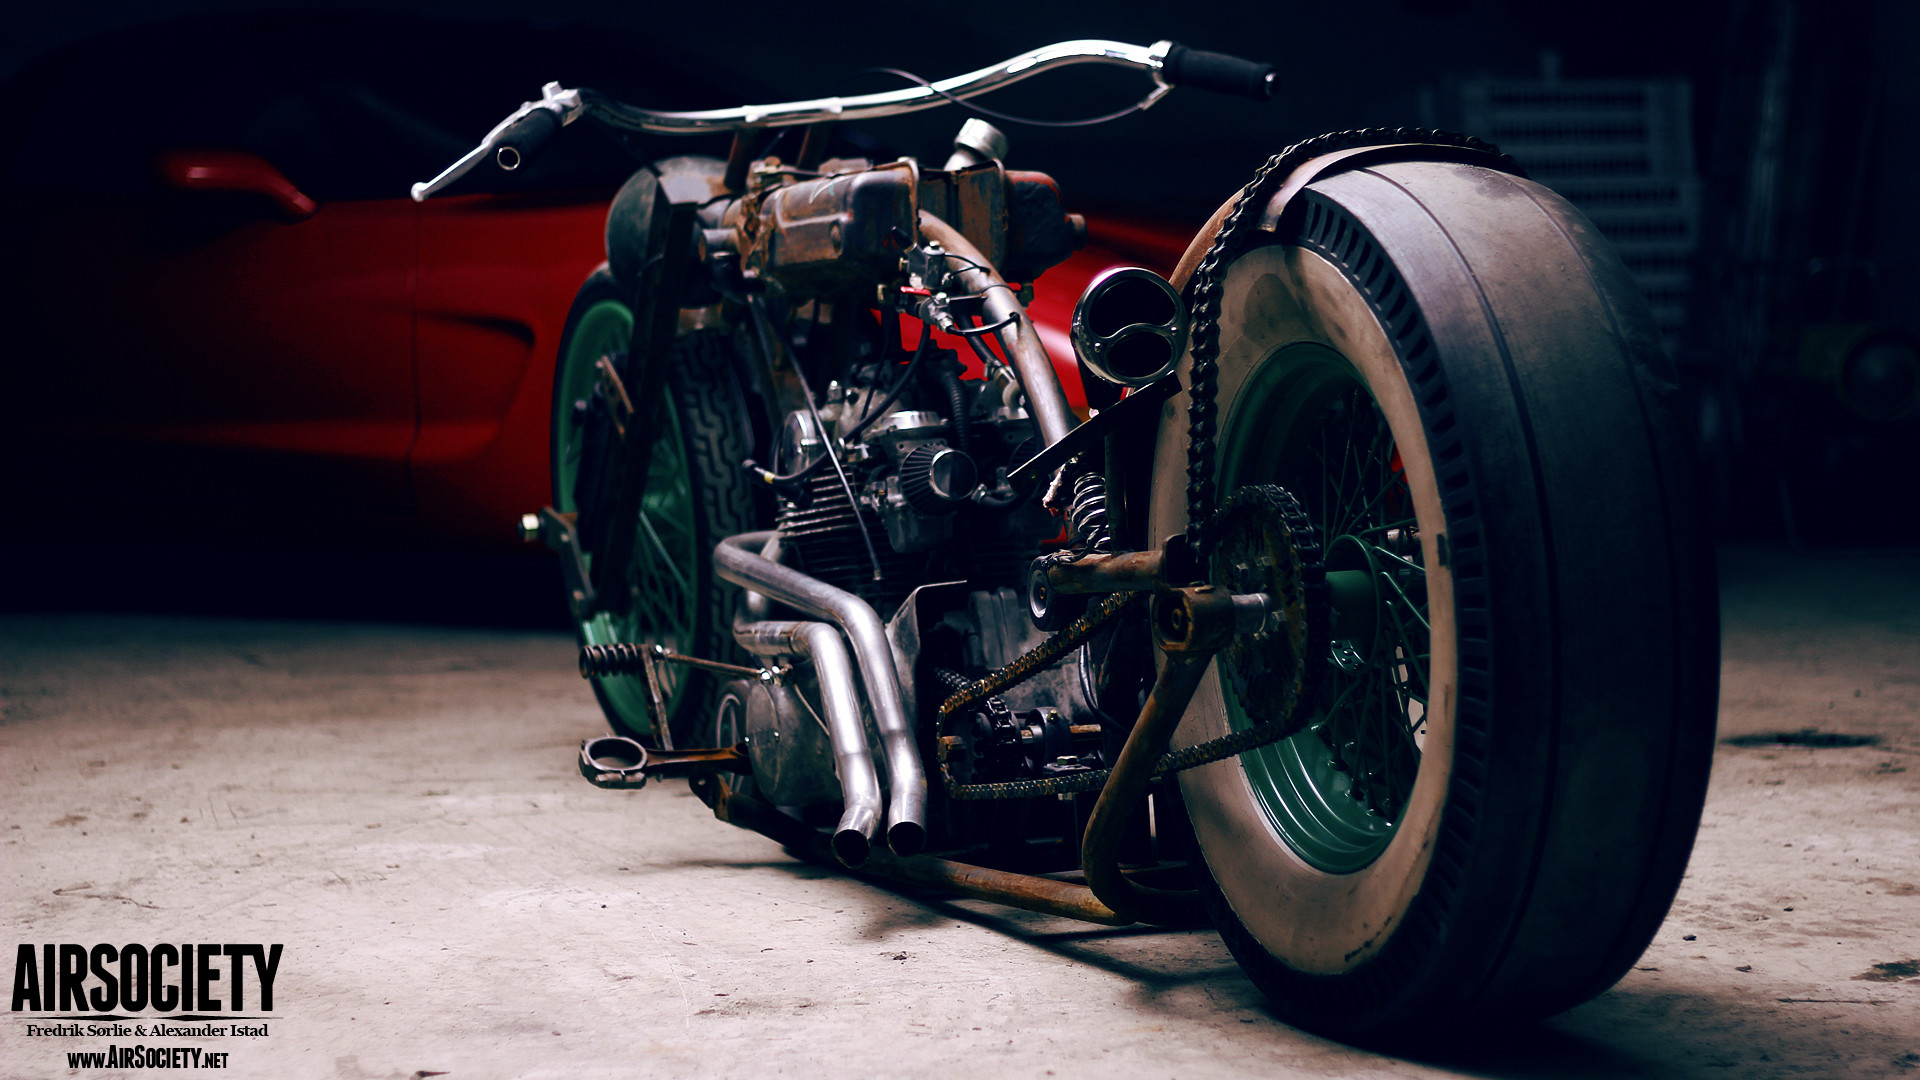 Res: 1920x1080, ... rat-bike-air-ride-suspension-bagged-rust-motorcycle- ...